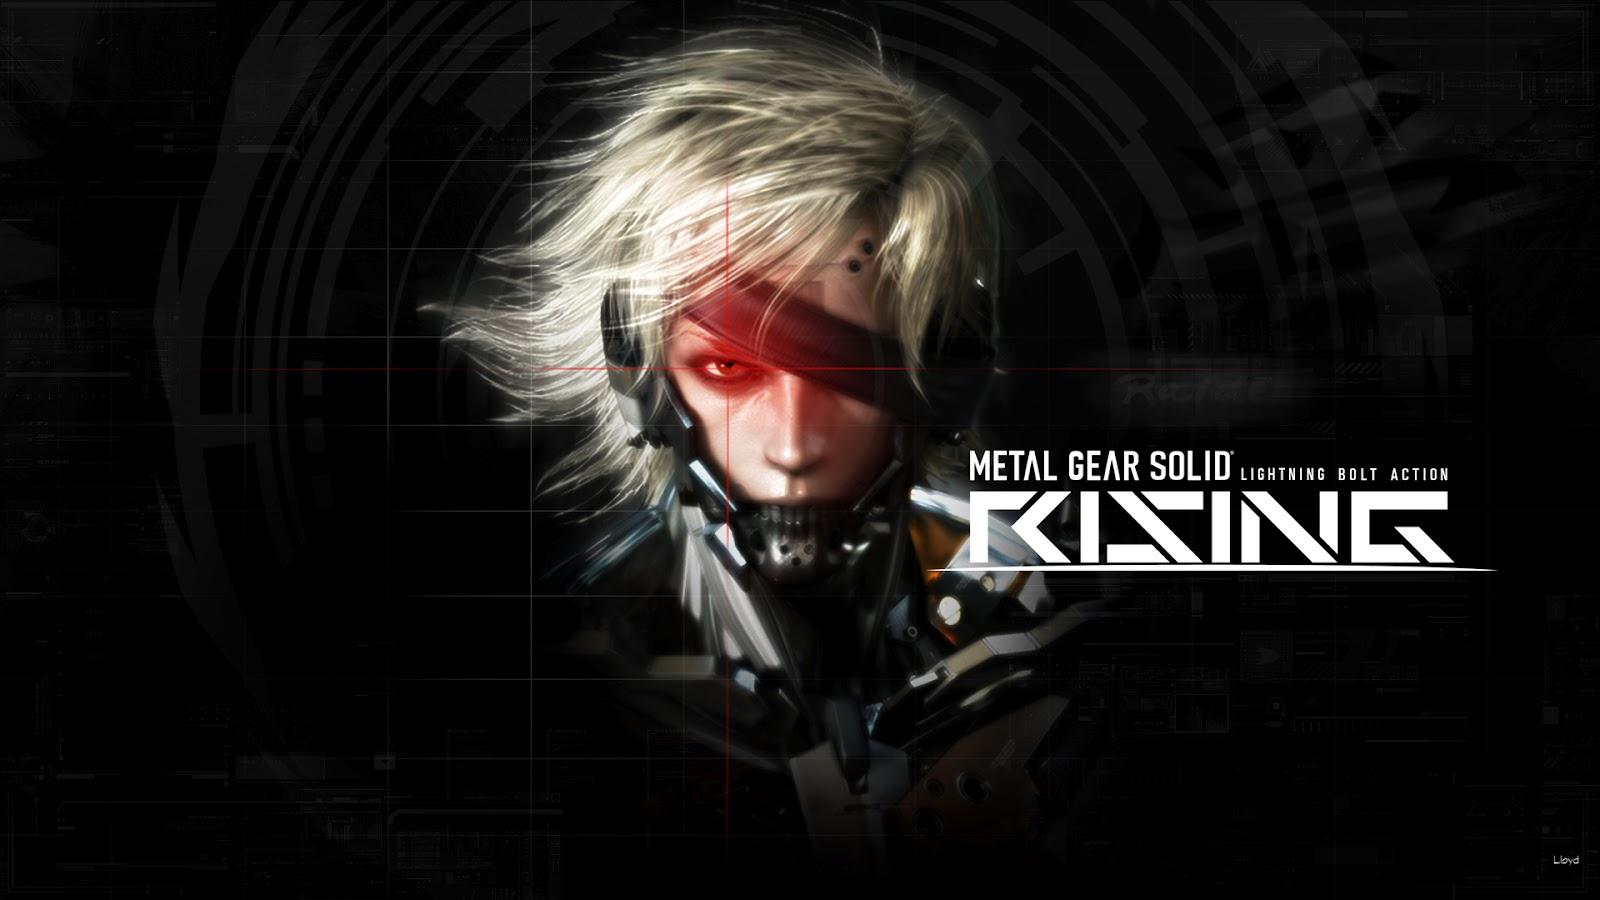 http://4.bp.blogspot.com/-7FMA4dkwFKw/UBcyxyXZMTI/AAAAAAAAHxA/fqTM0bBGuPw/s1600/Metal_Gear_Solid_Rising_Wp_by_igotgame1075.jpg